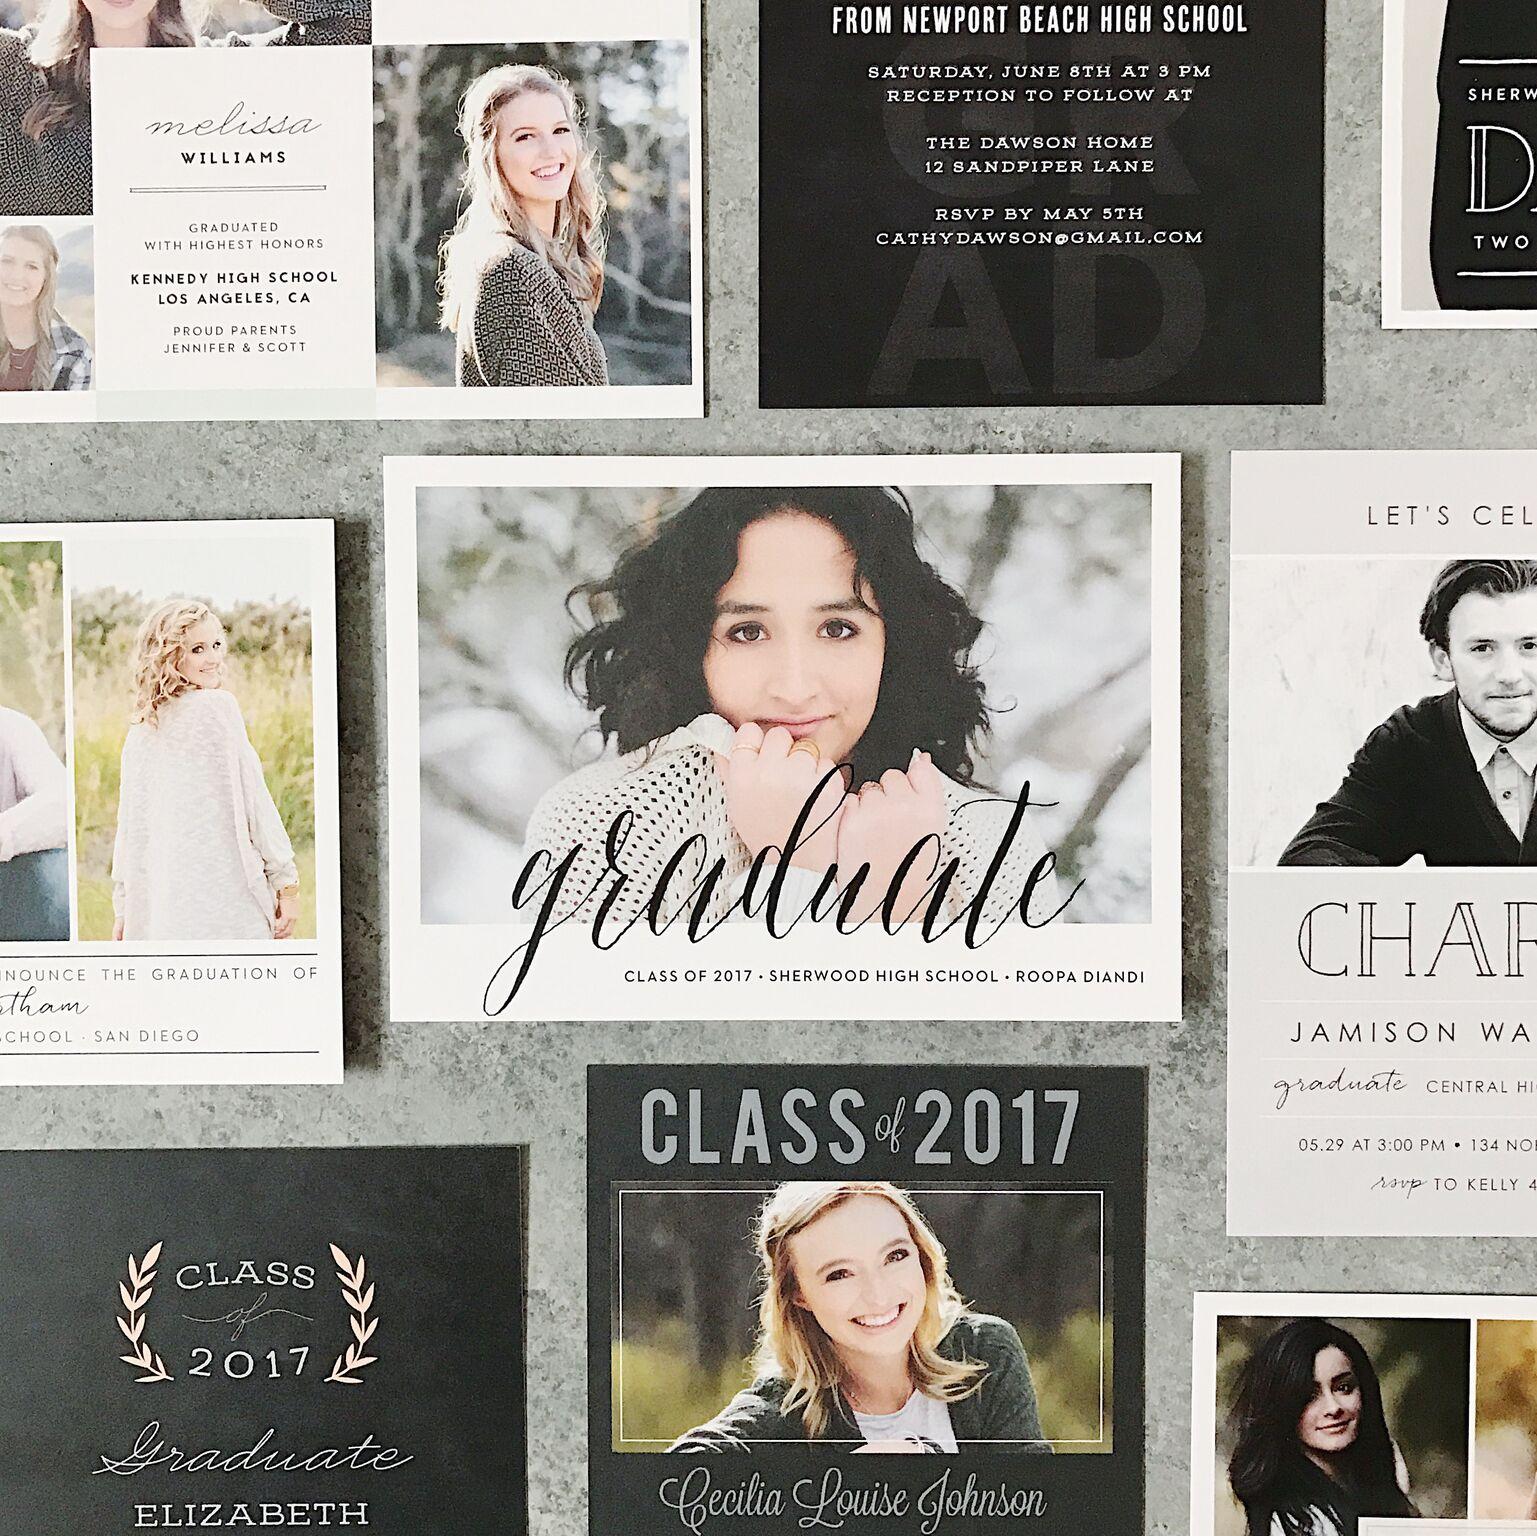 Basic_Invite_Graduation_announcements_and_invitations_5_preview